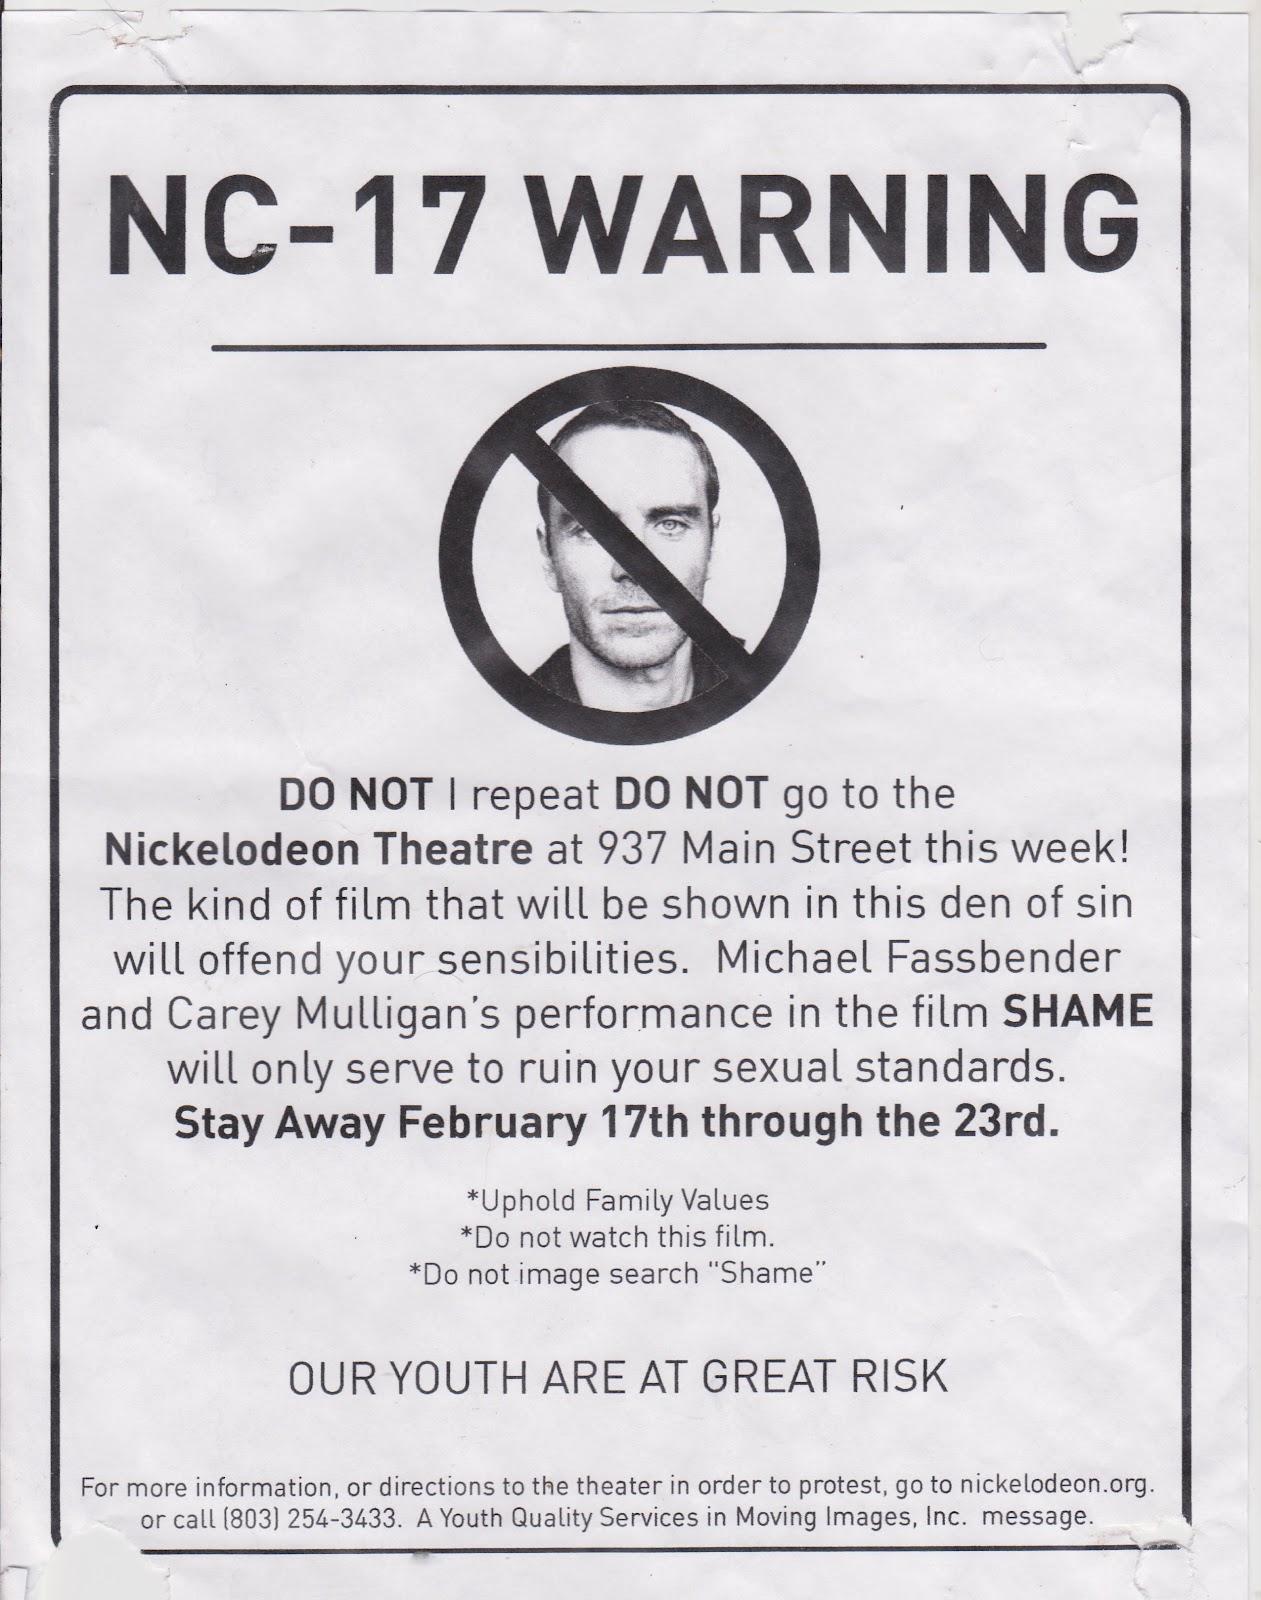 Fassinating Fassbender - A Michael Fassbender Fan Blog: An Anti